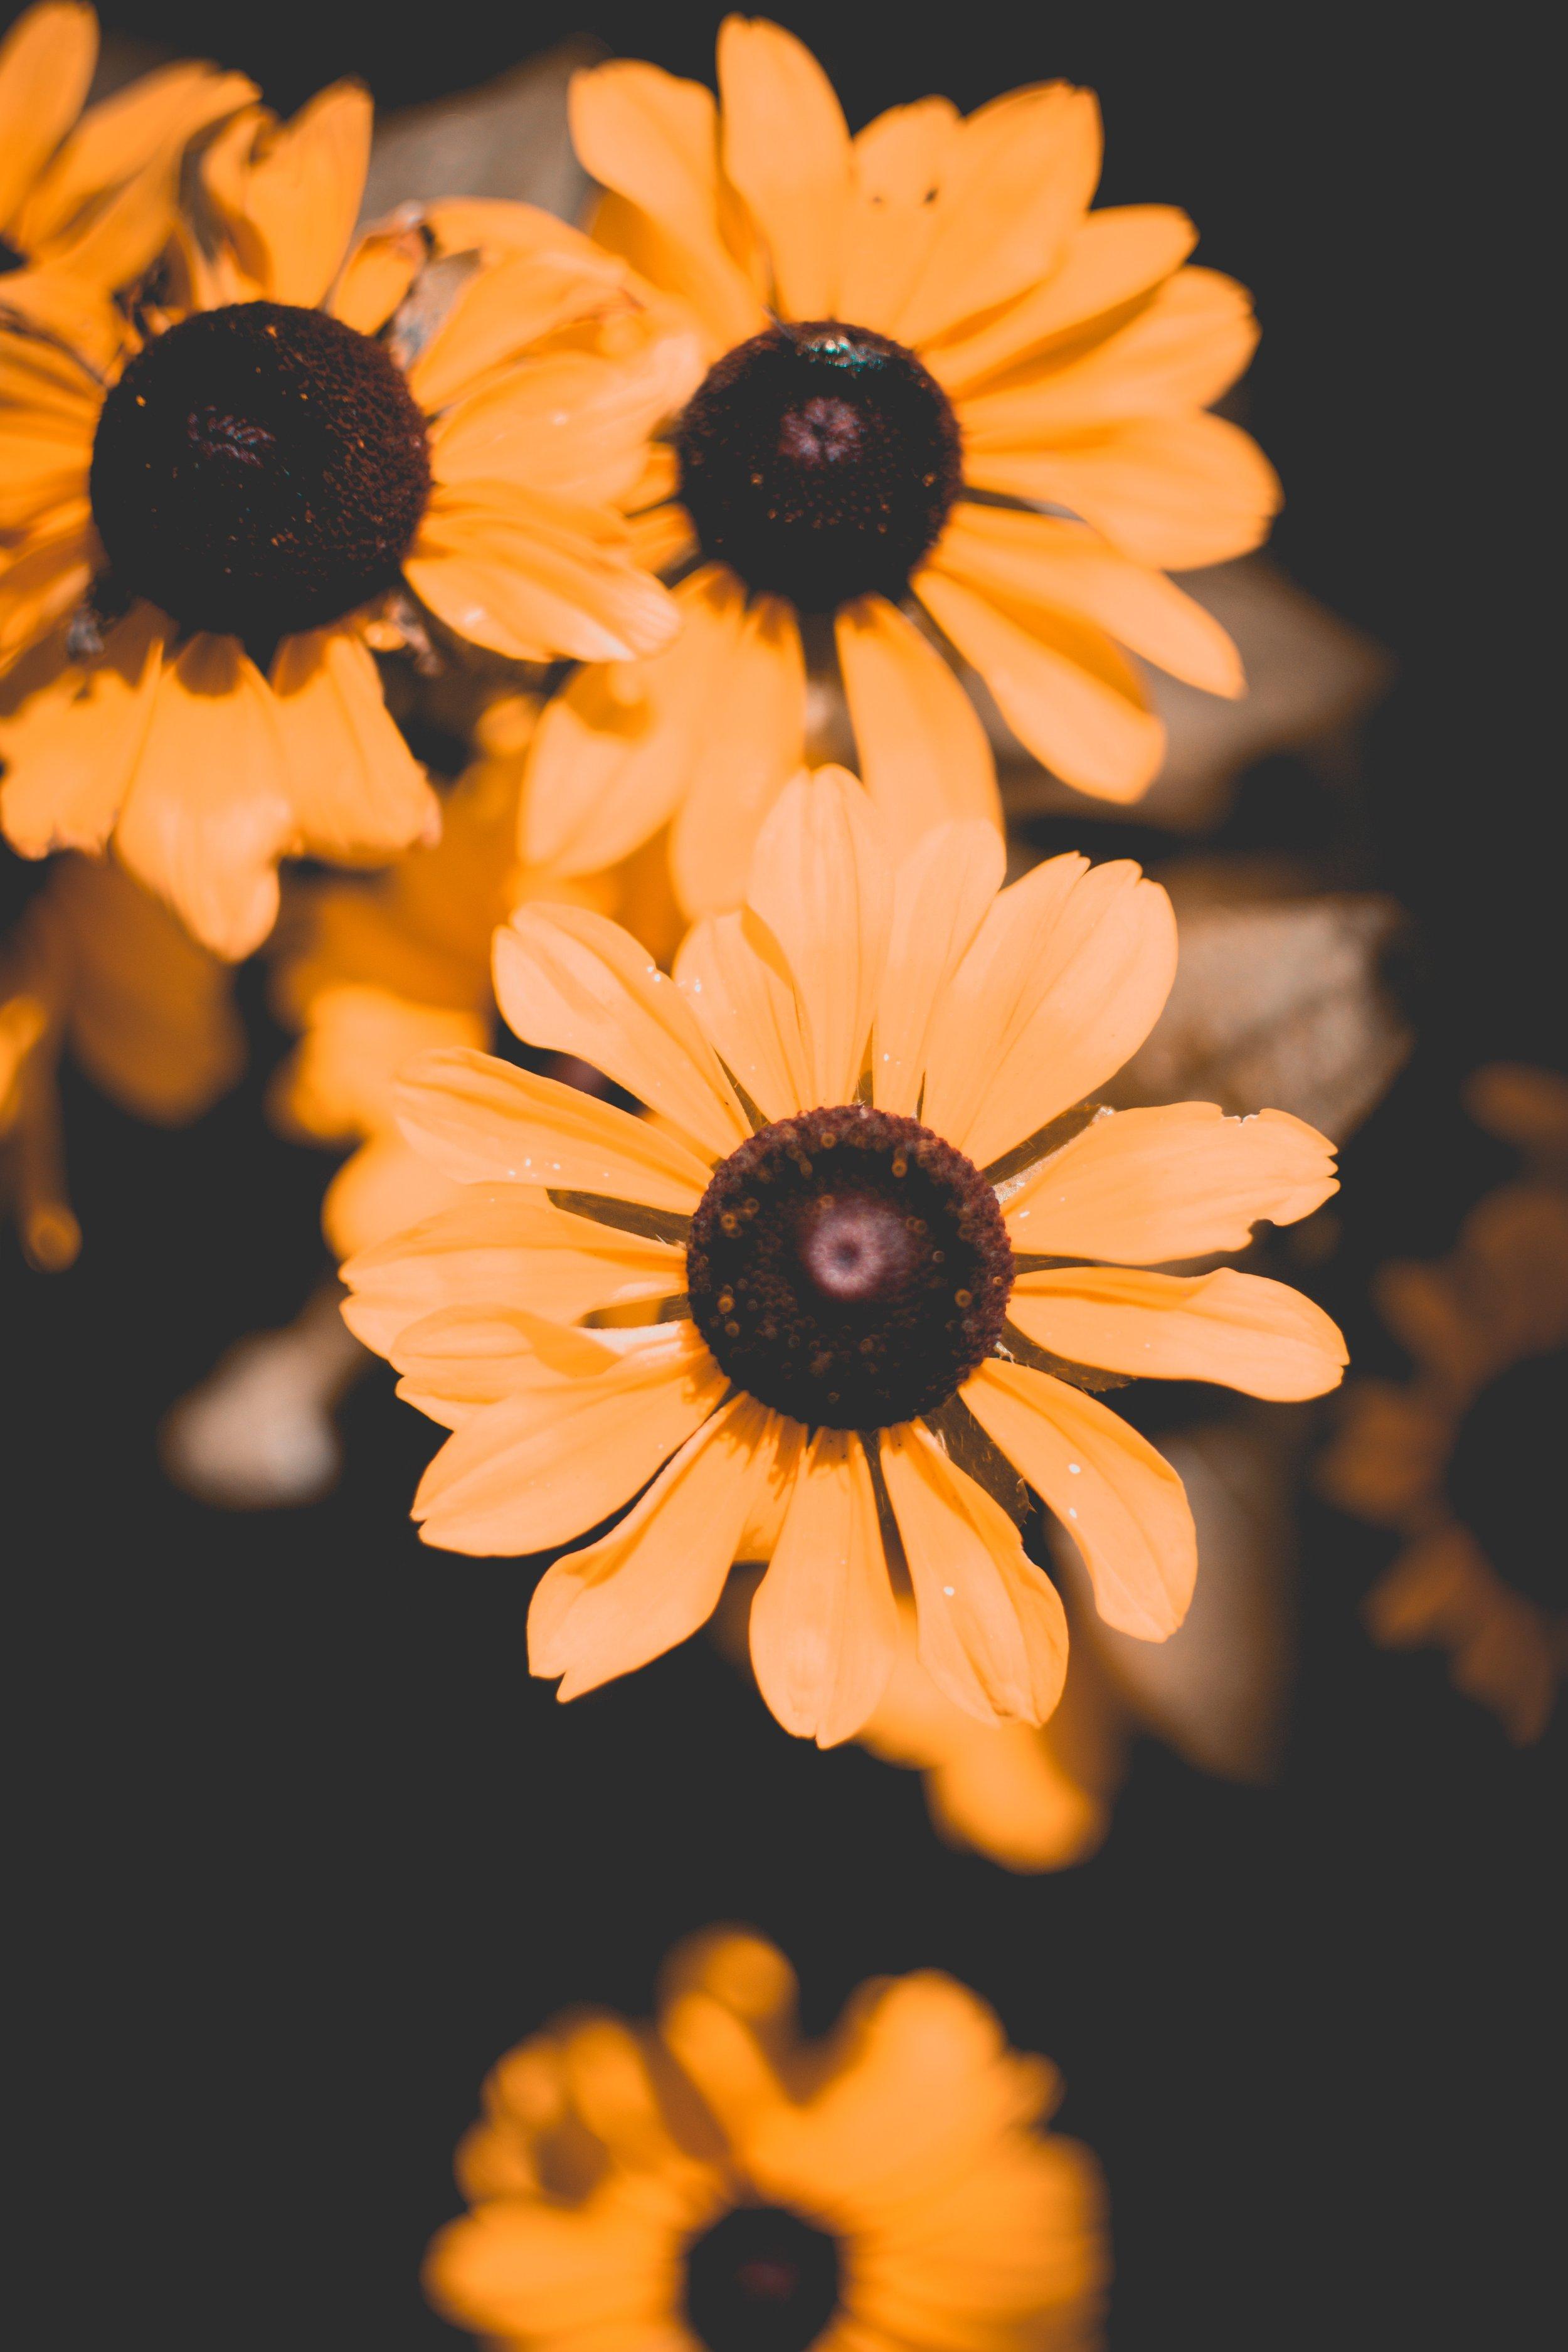 beautiful-beautiful-flowers-blooming-1275603.jpg